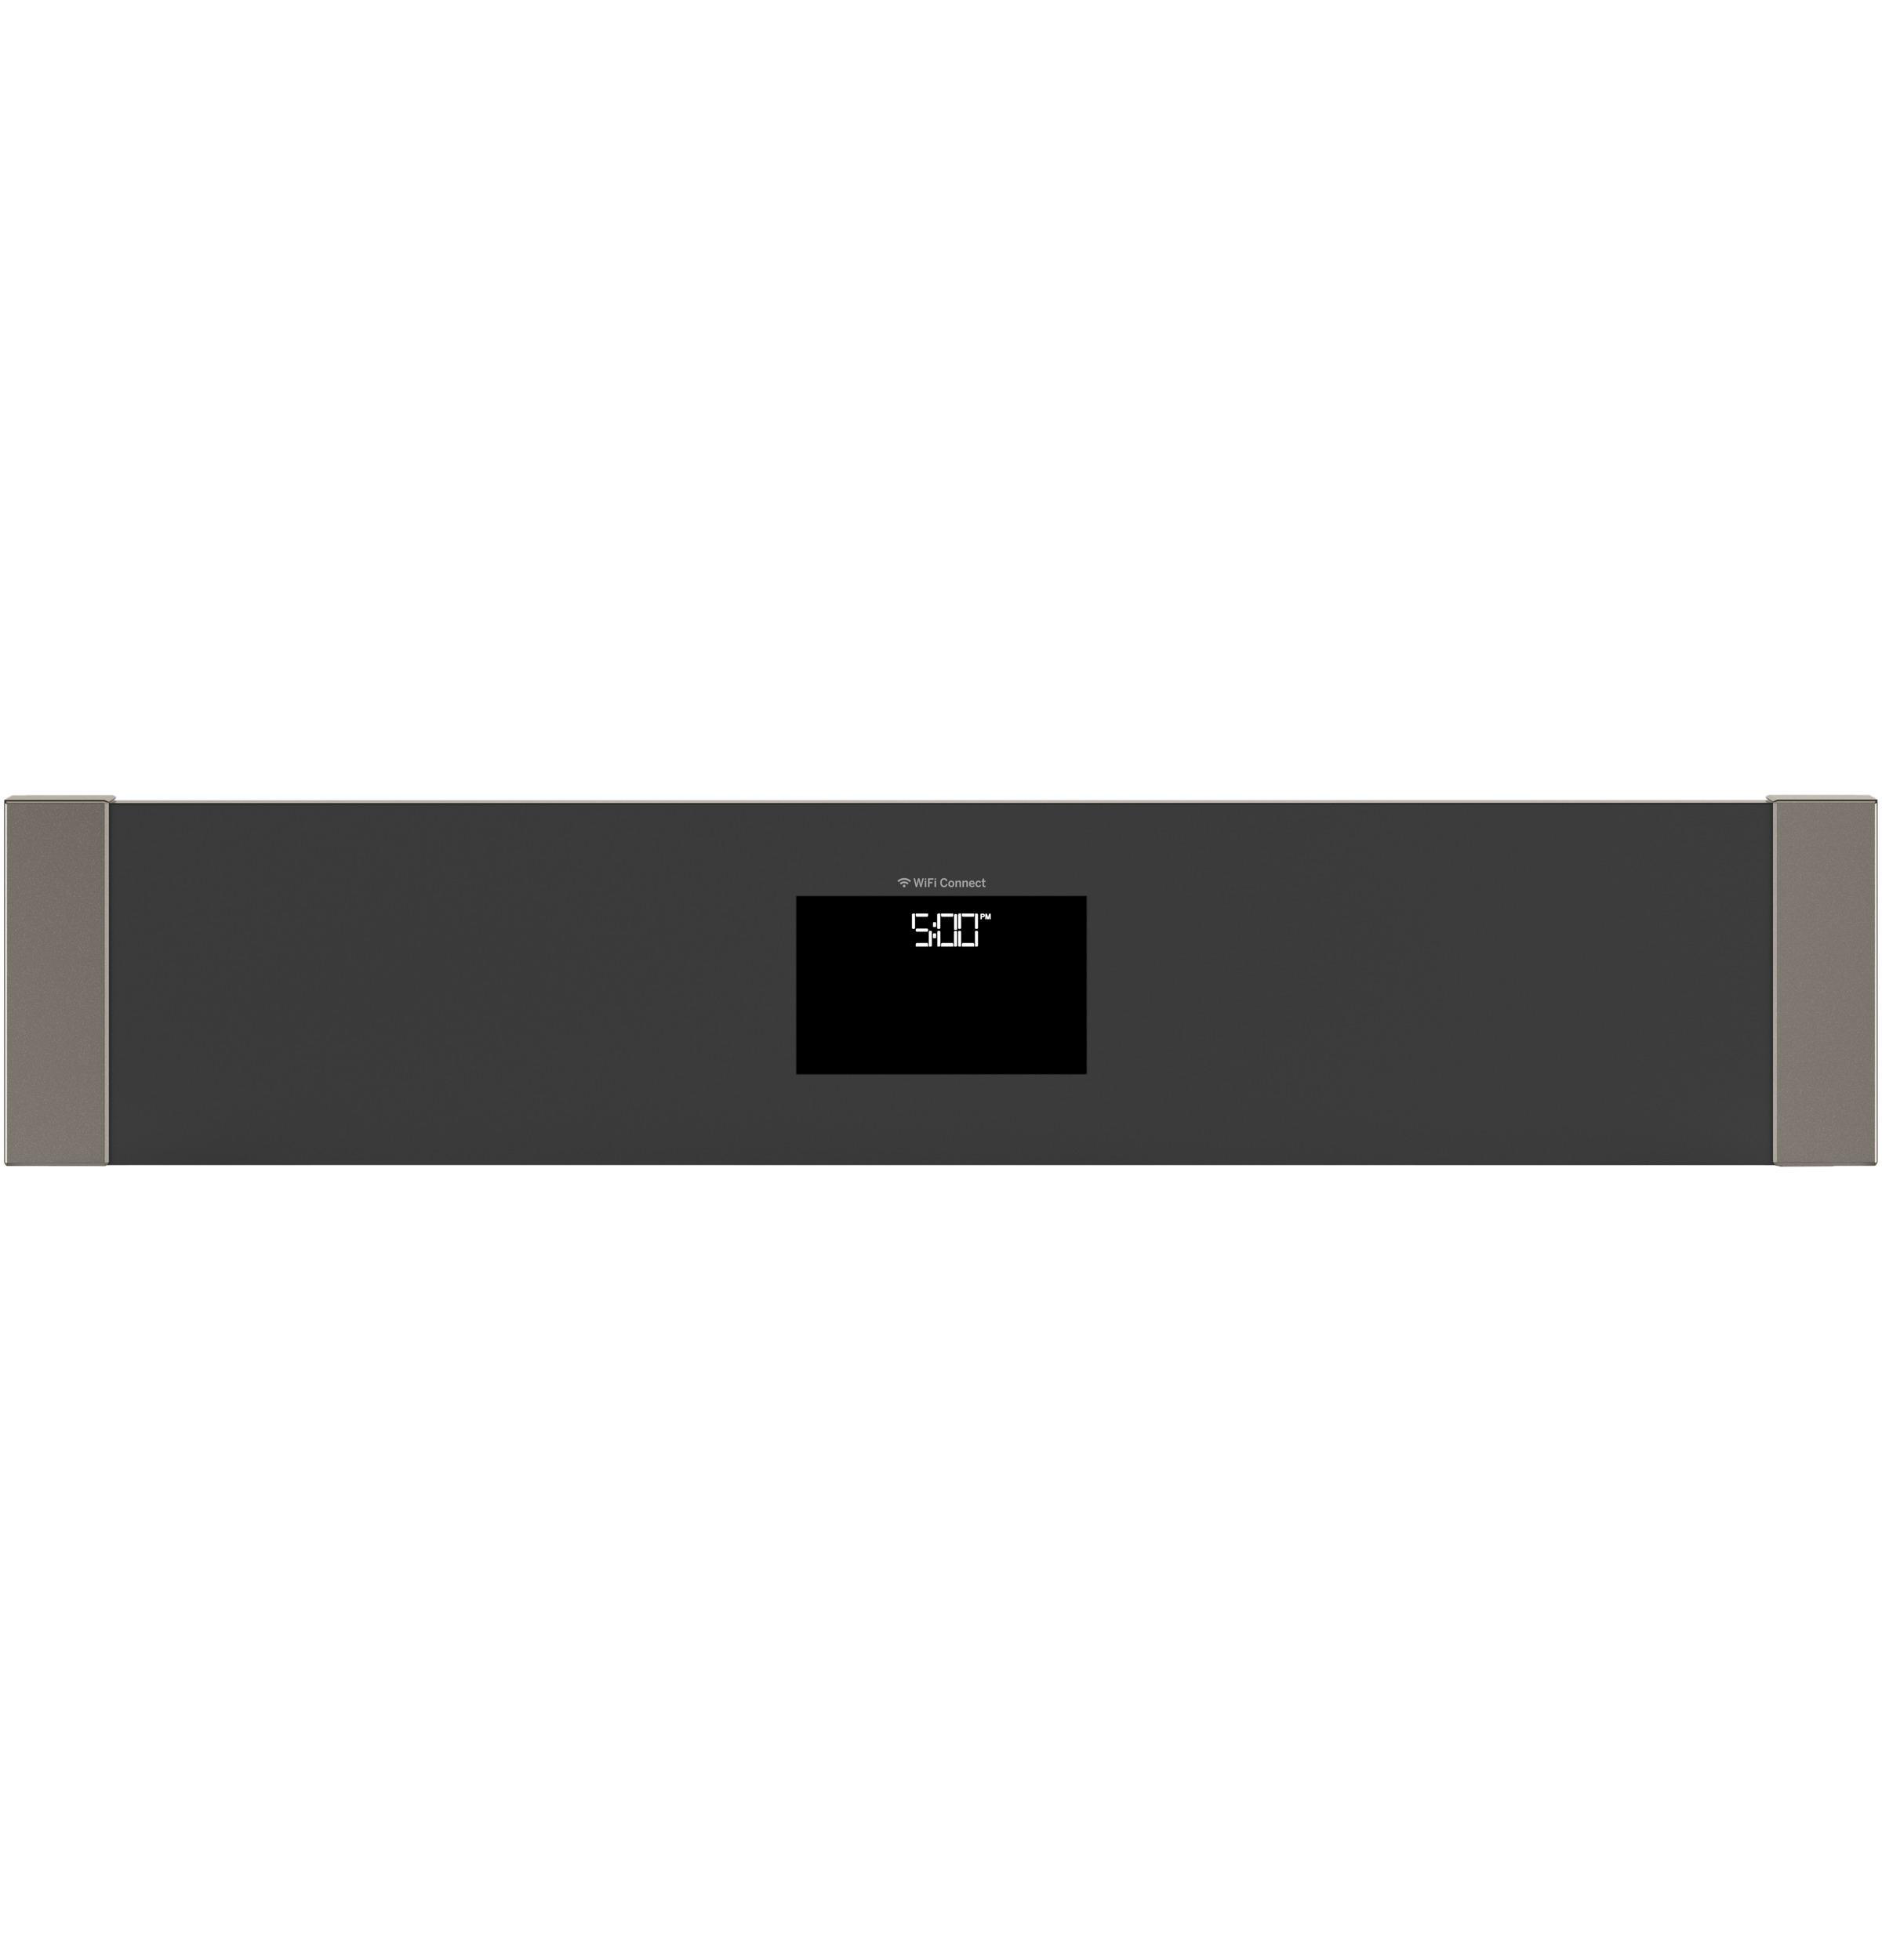 "Model: JKS5000ENES | GE GE® 27"" Smart Built-In Convection Single Wall Oven"